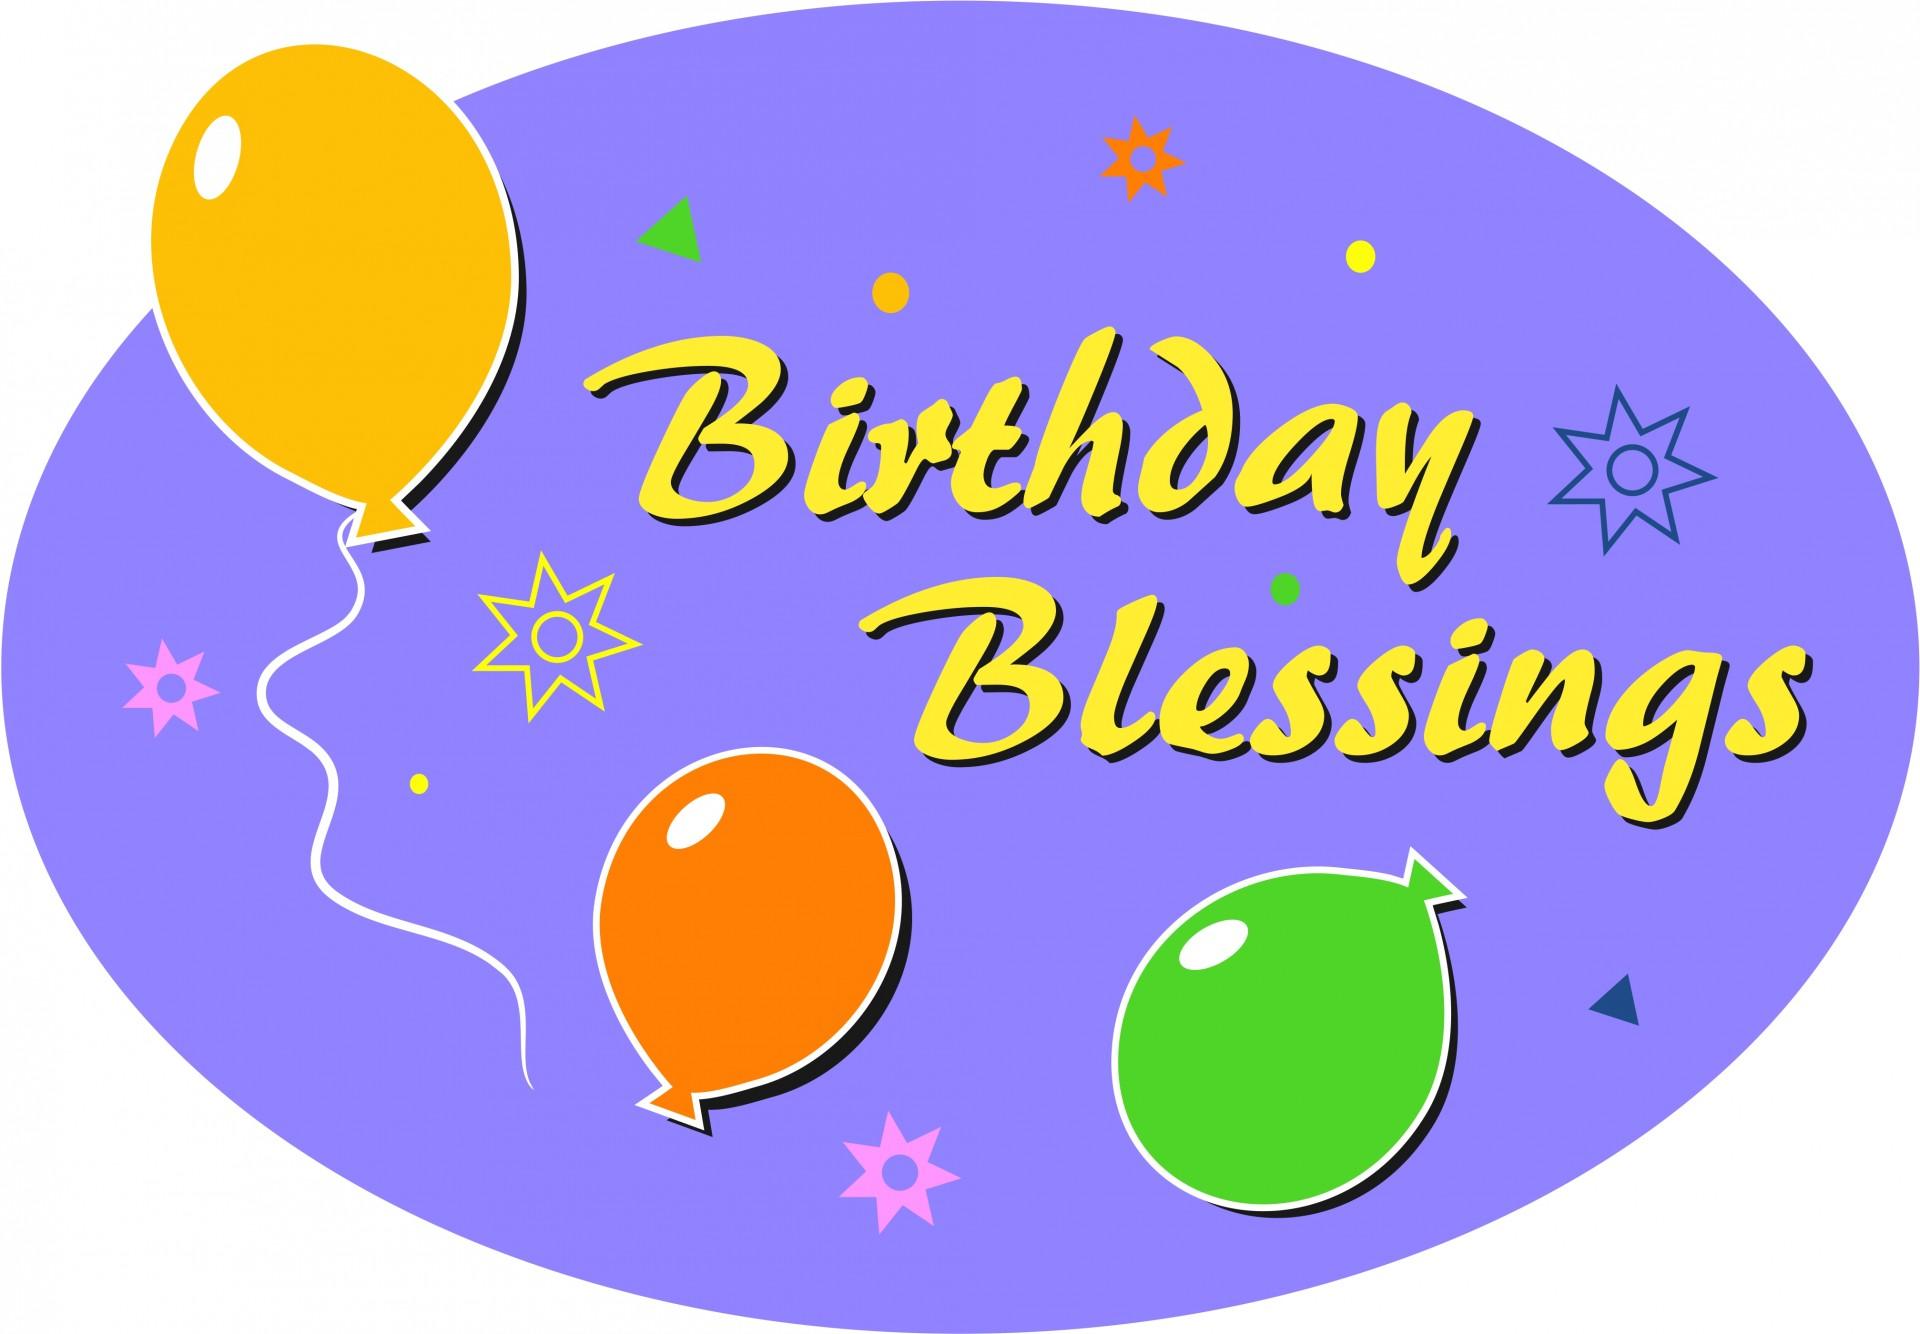 1920x1334 Birthday Blessings Clip Art Free Stock Photo